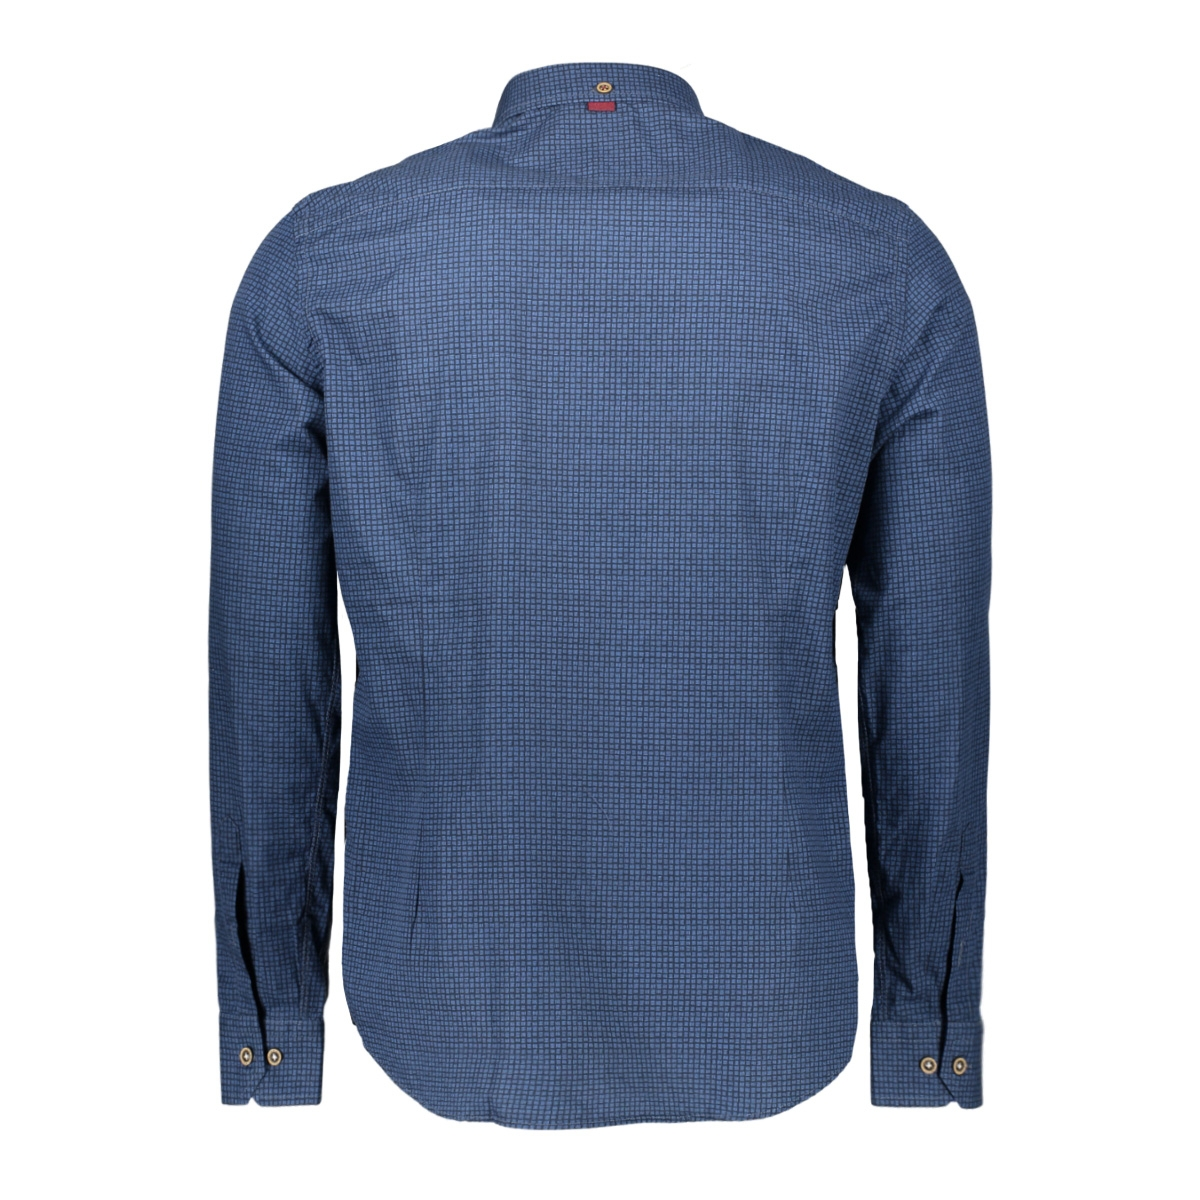 srt006 companeros overhemd 06blue